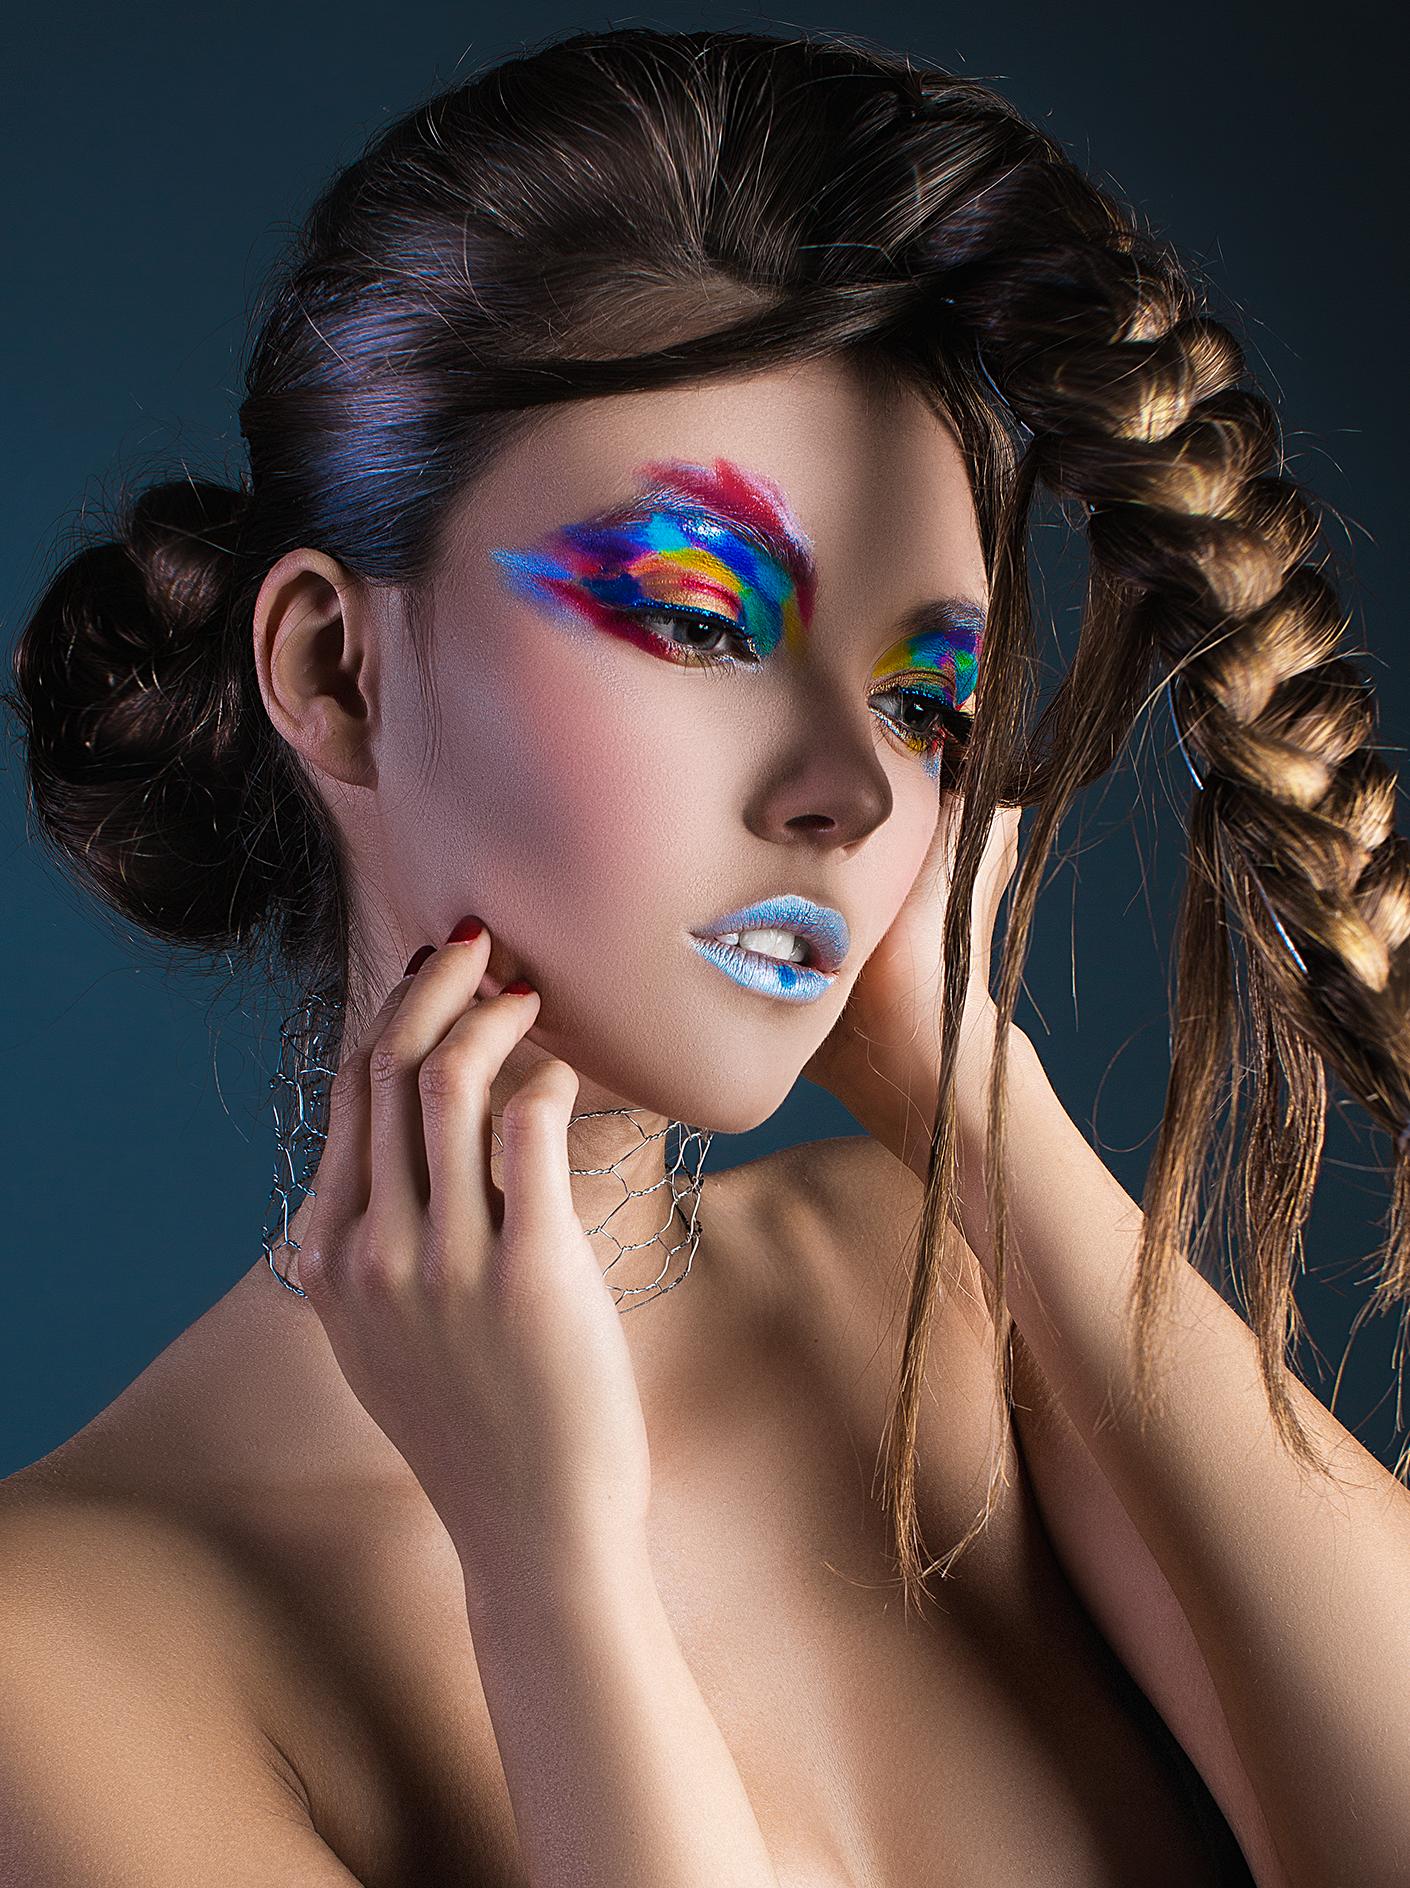 Photography: Sergey Po /